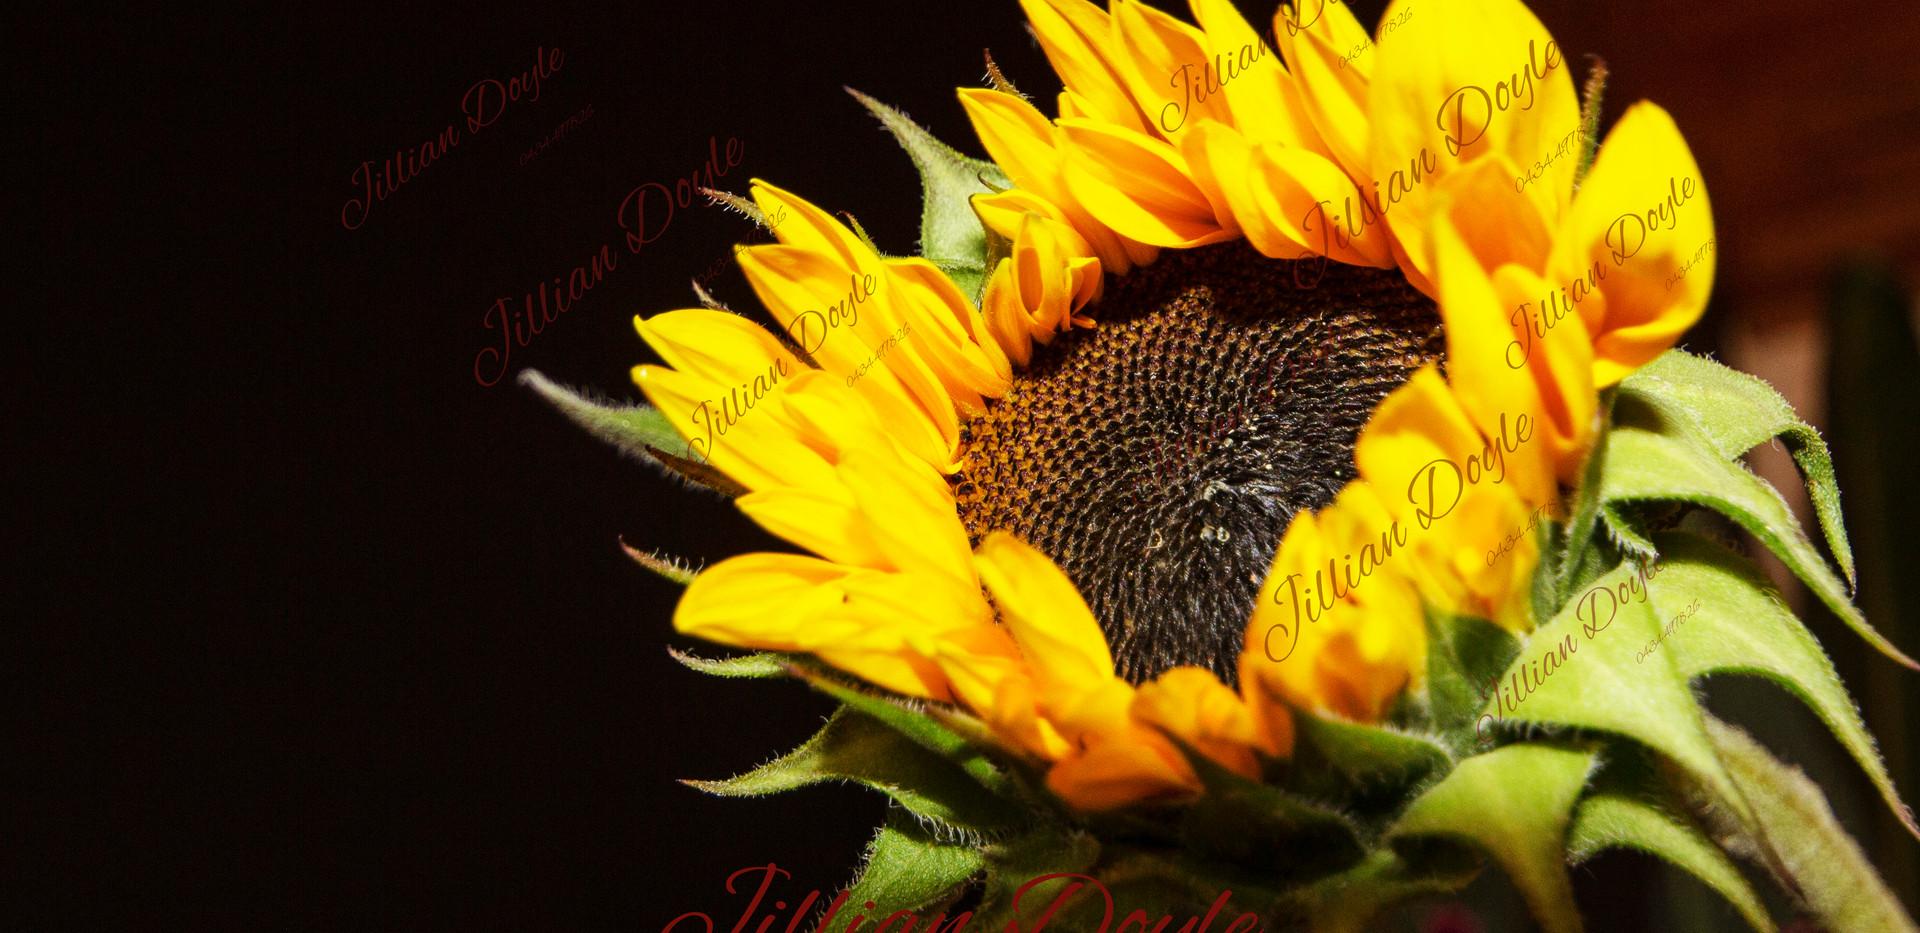 Sunflower 9404 (c) JDoyle.jpg